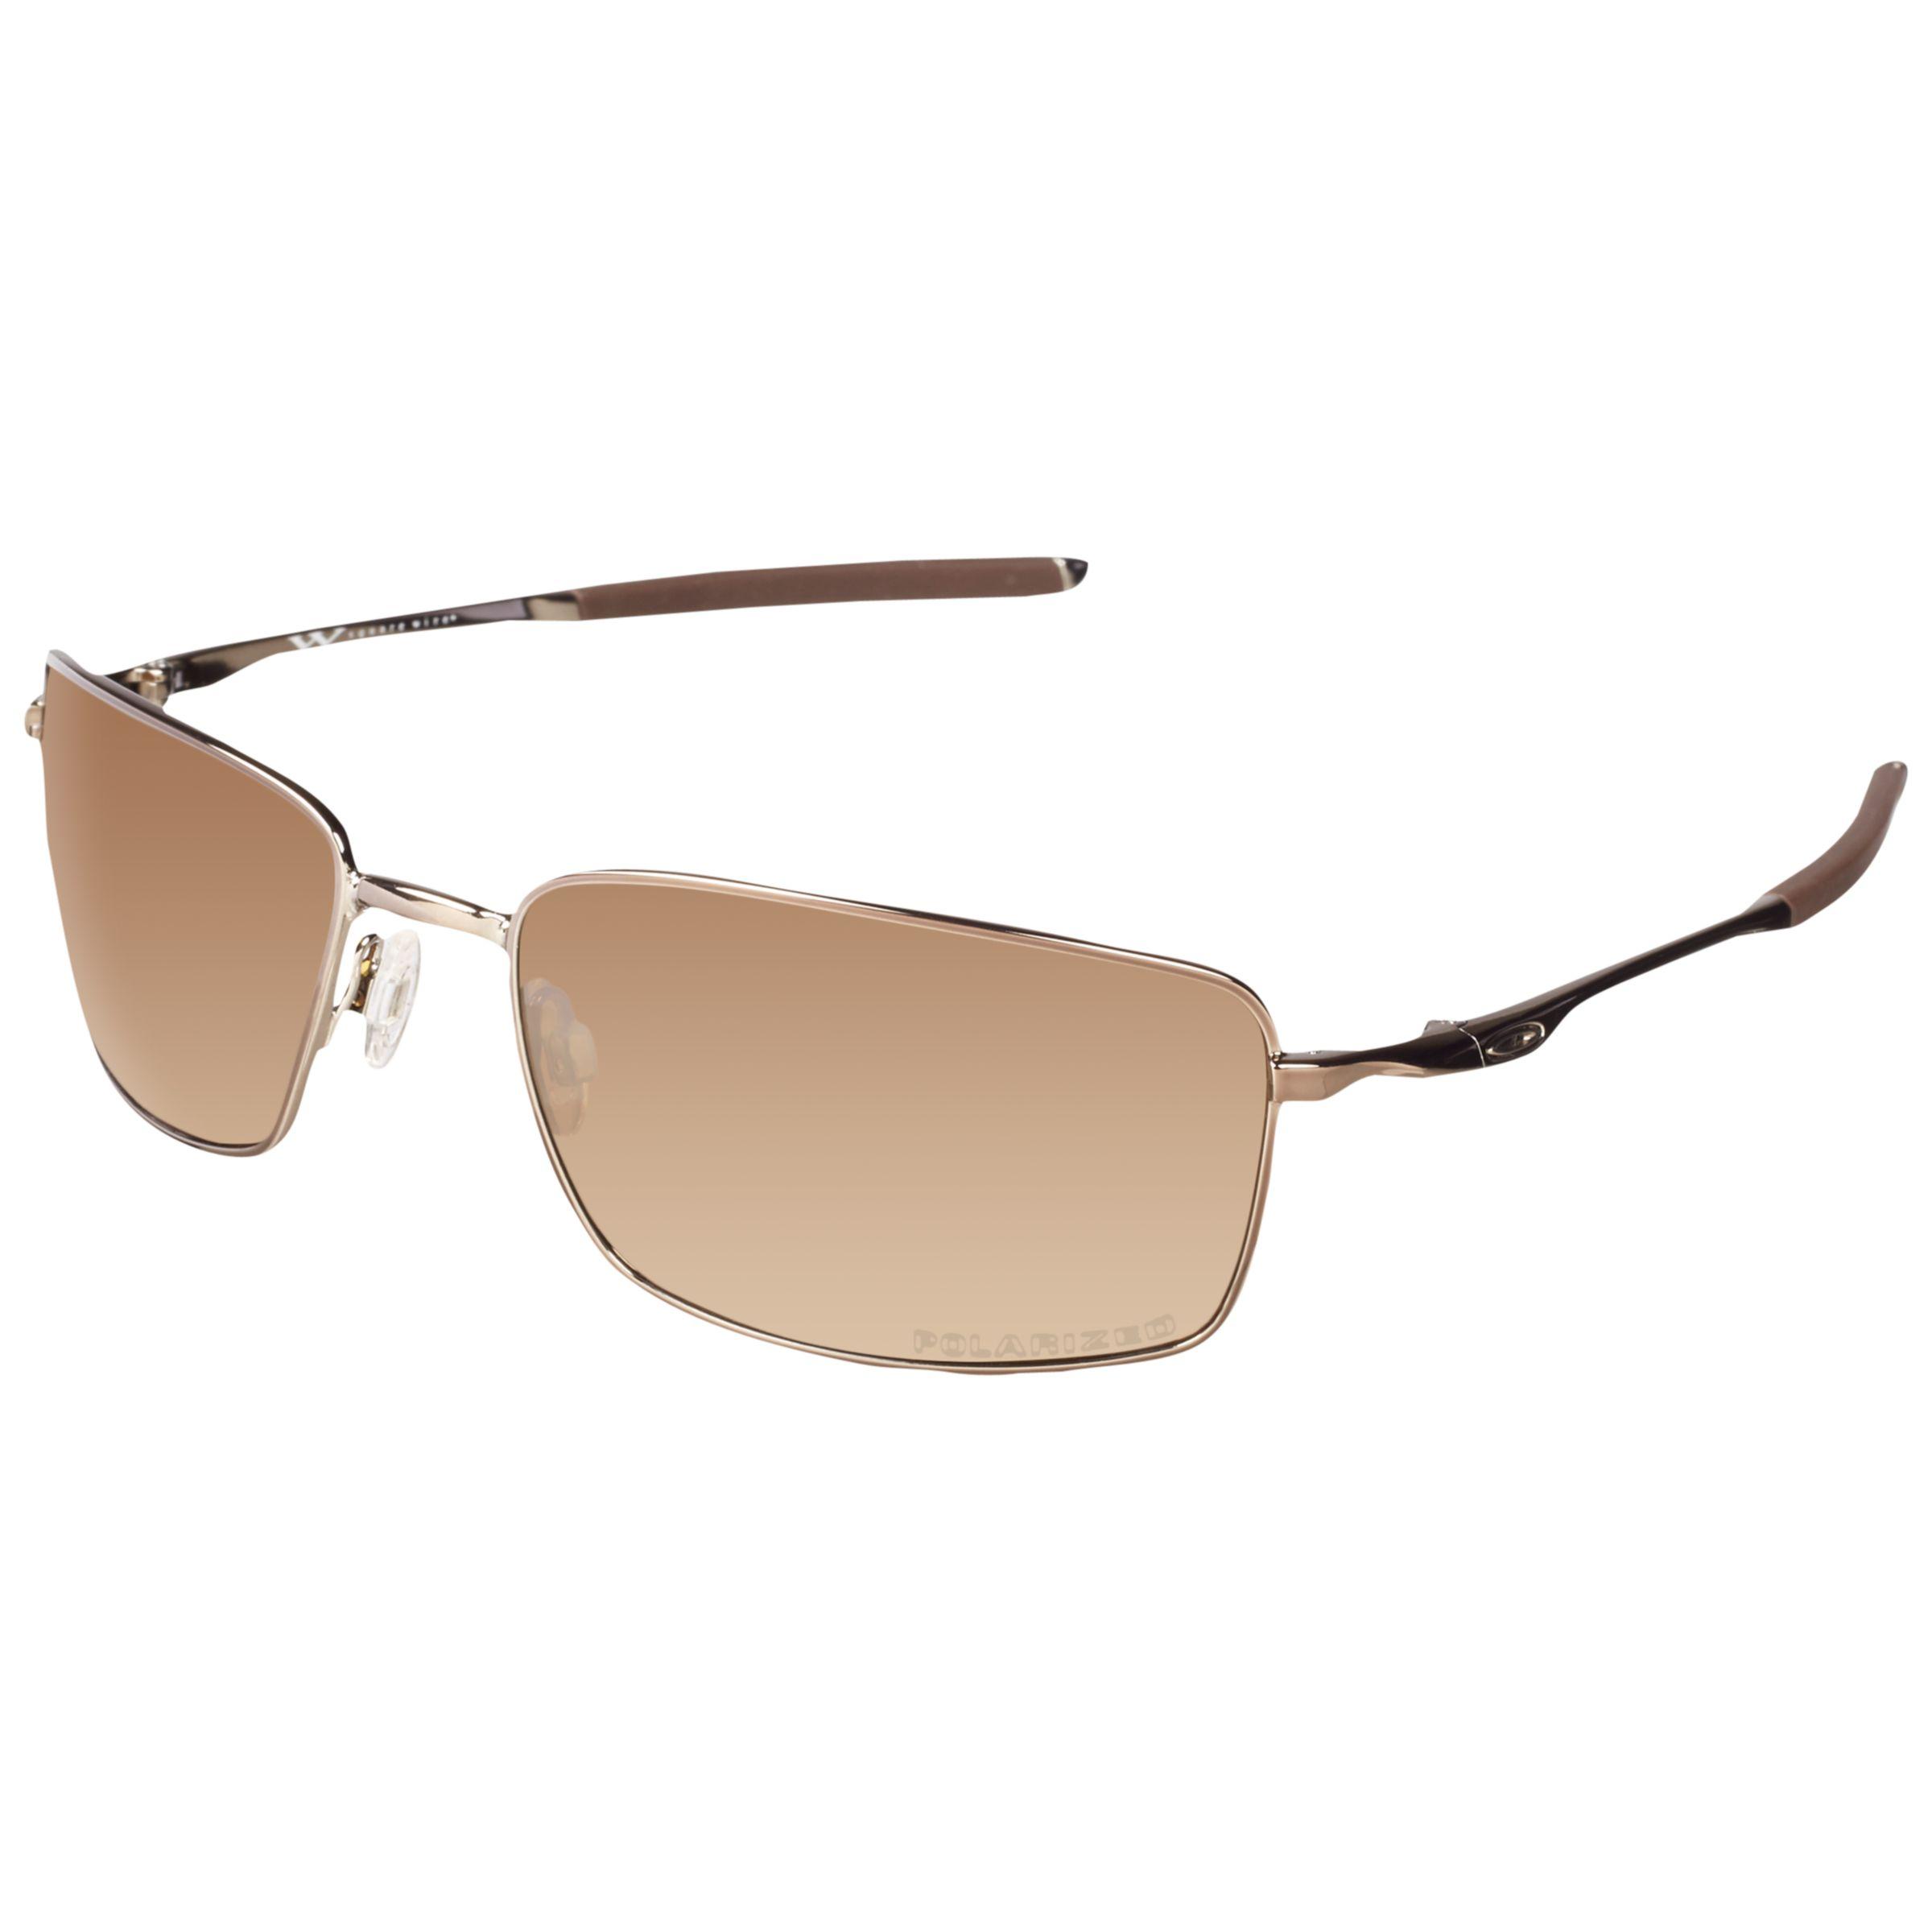 Oakley Metal Frame Glasses : Oakley Metal Frame Sunglasses